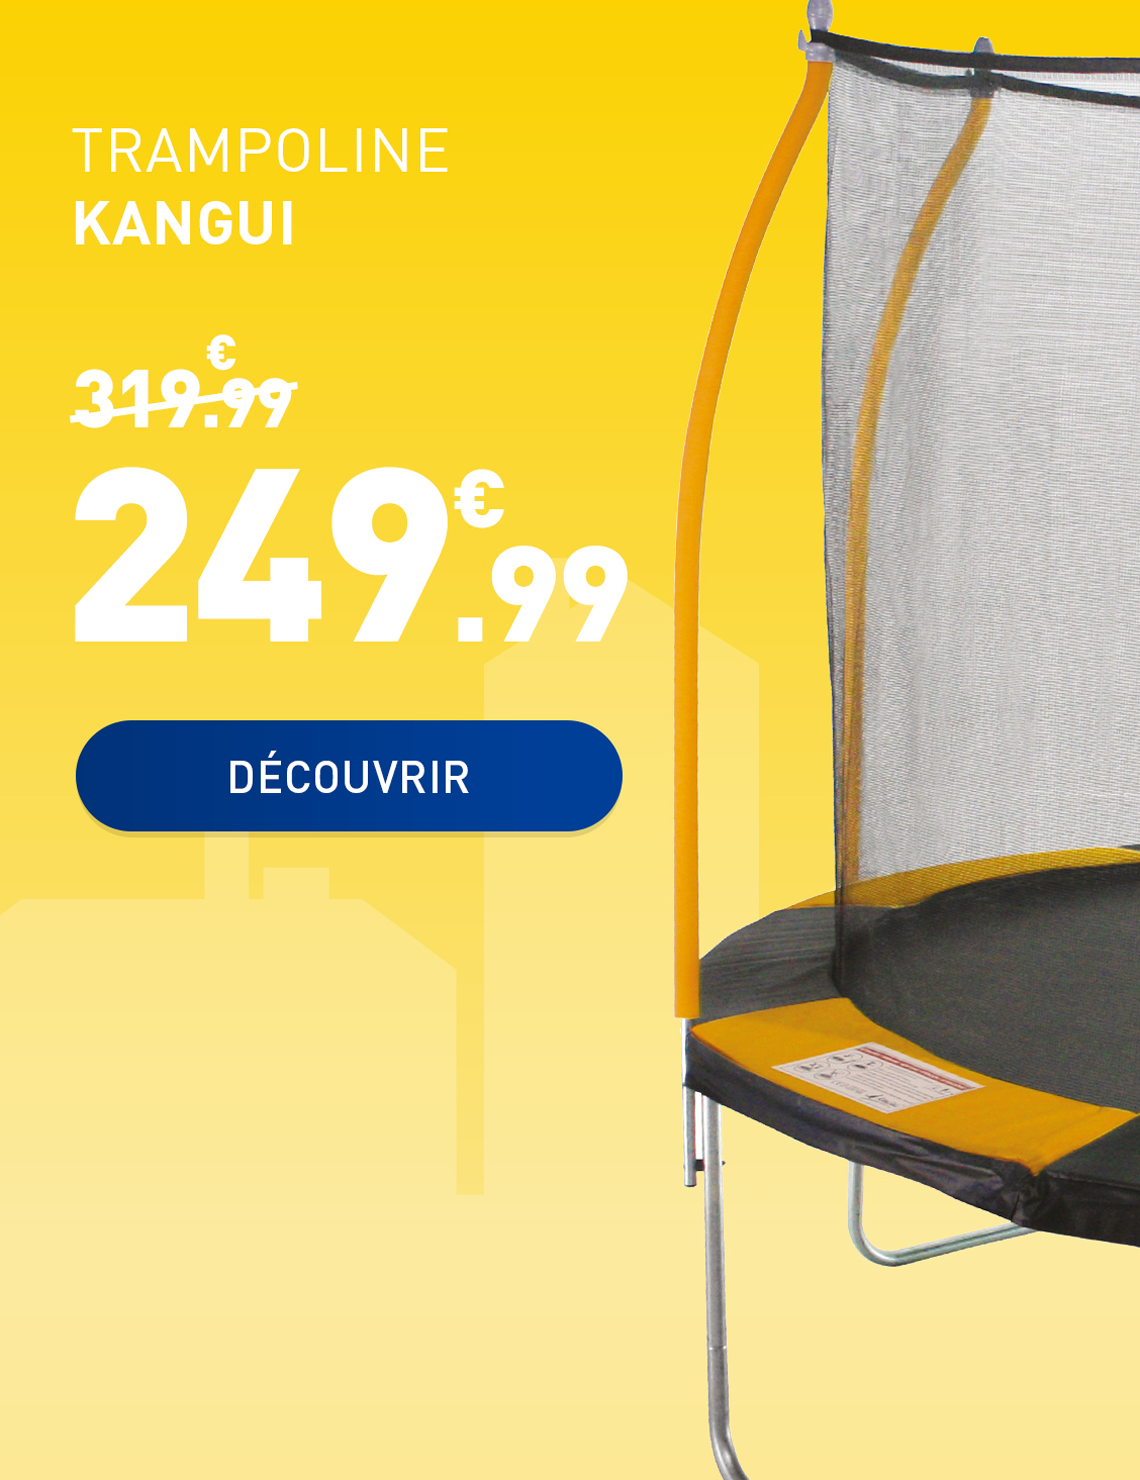 8_trampoline-kangui_lp_noel2016